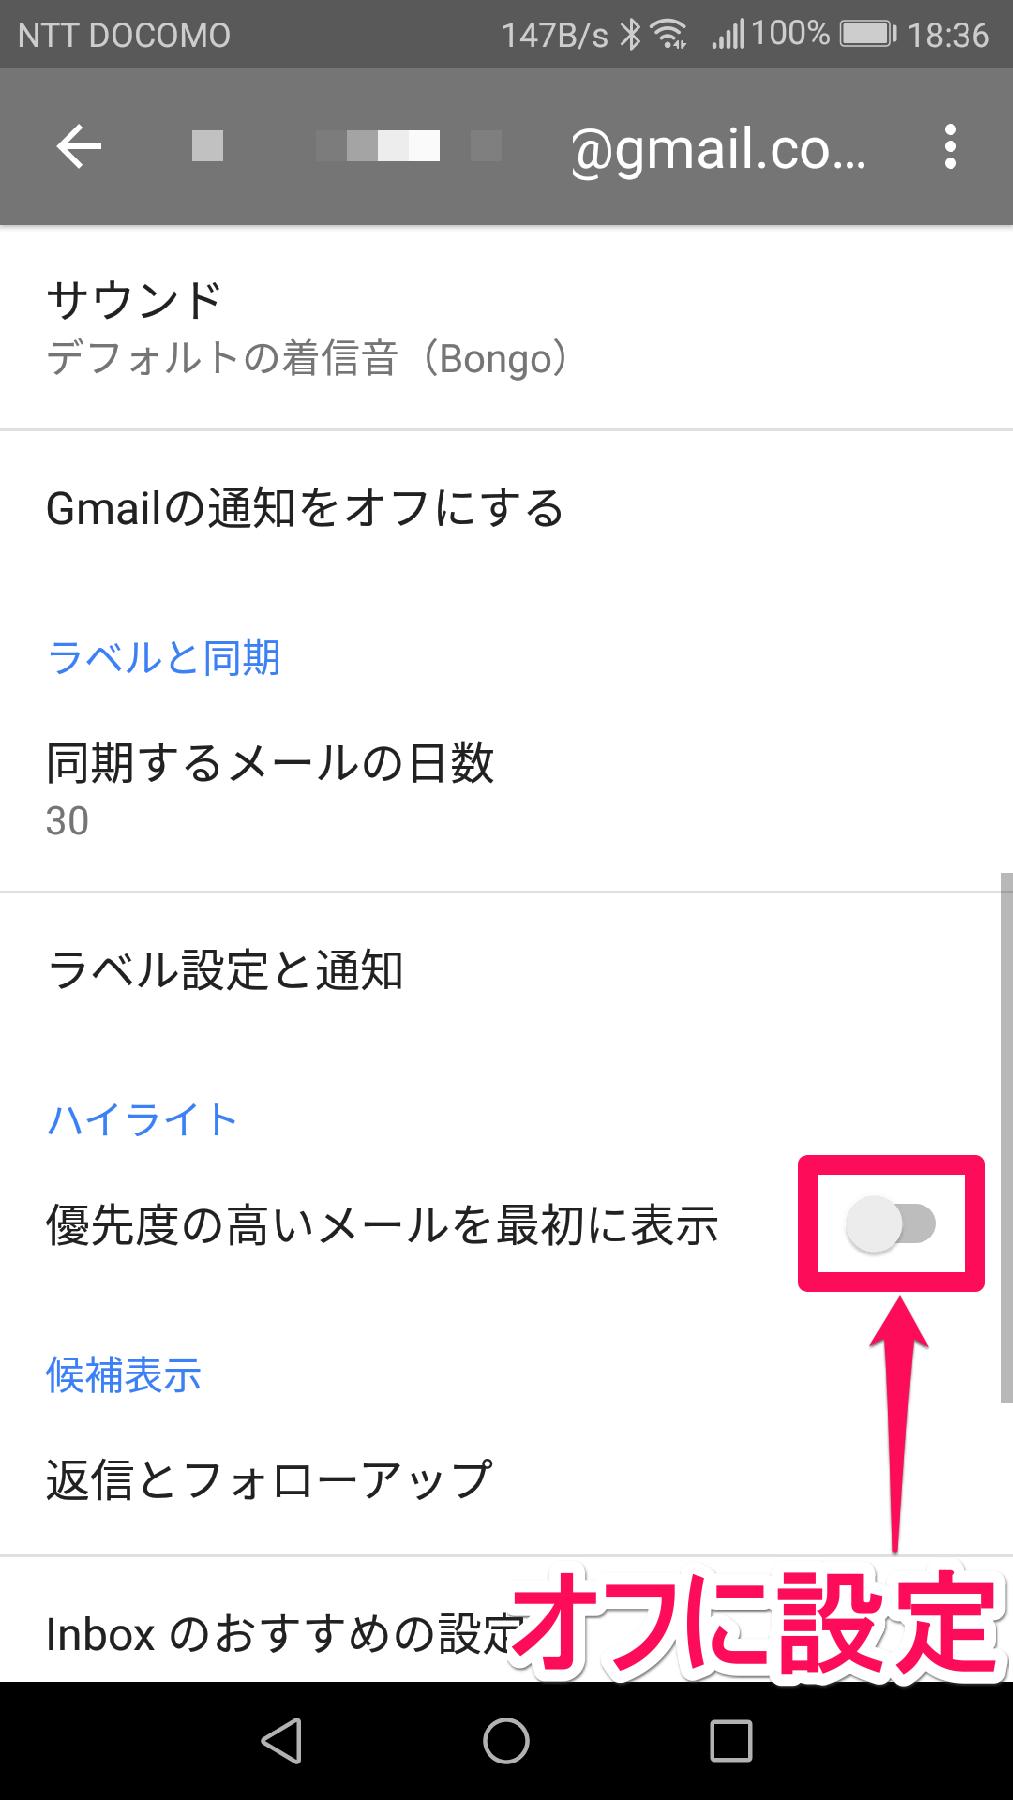 Inbox by Gmail(インボックス、ジーメール)の[設定]画面